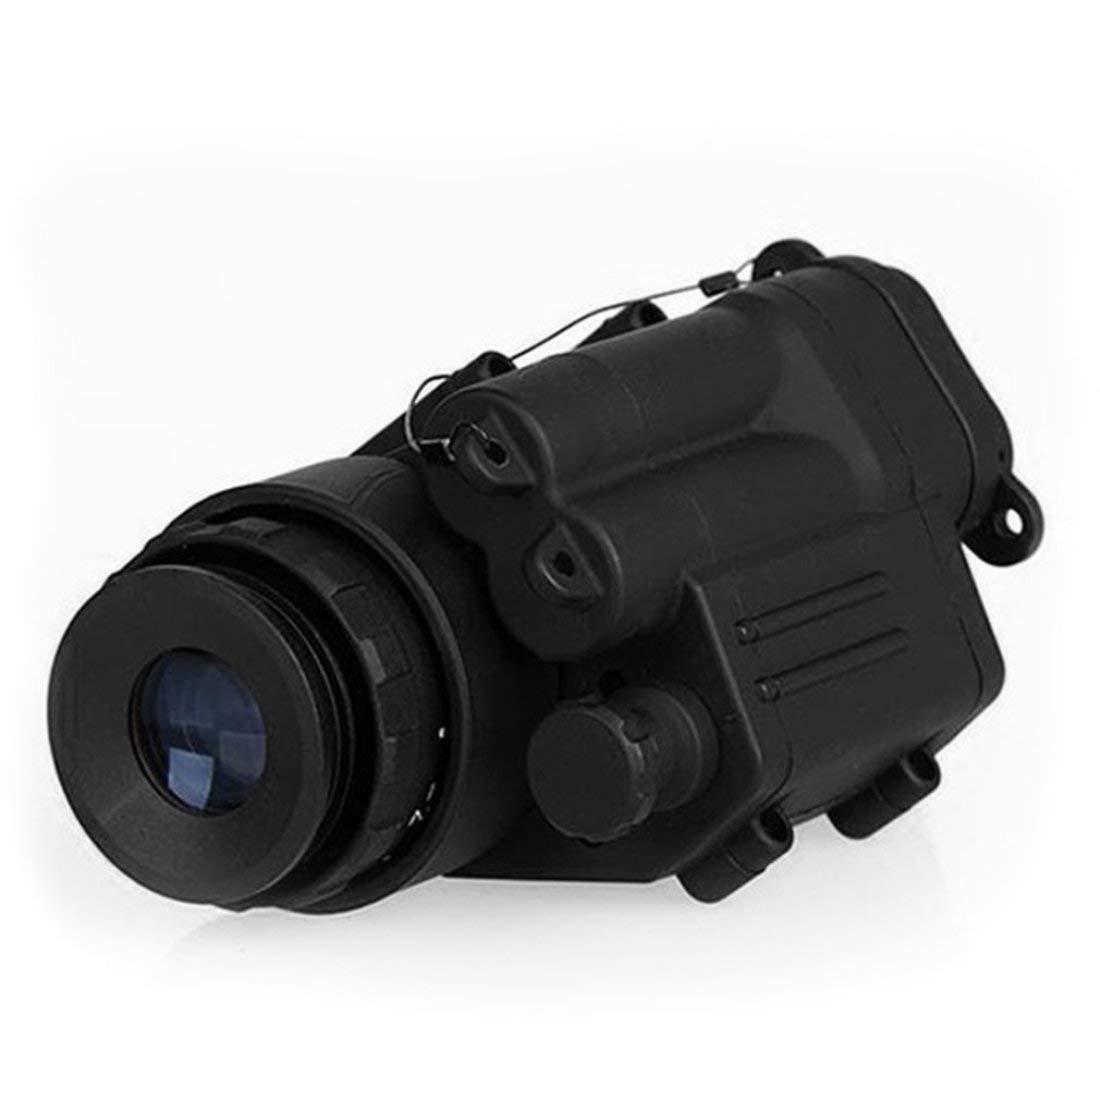 Cheap Pvs 14 Night Vision Goggles, find Pvs 14 Night Vision